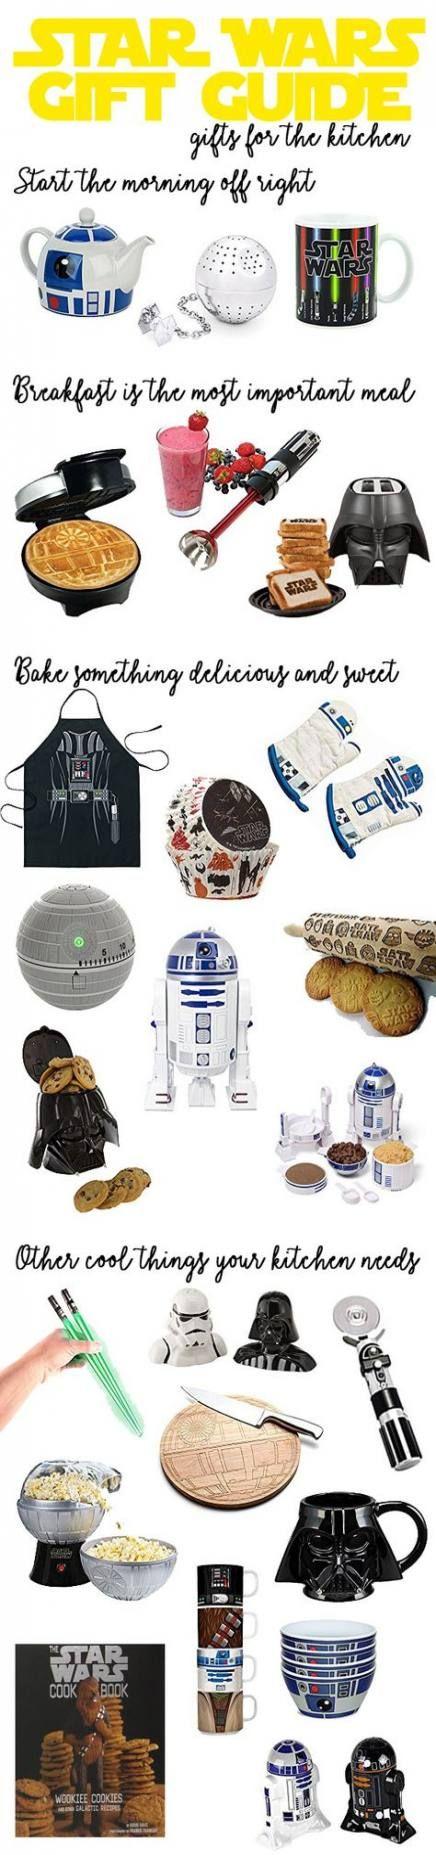 Gifts for boys boyfriends star wars 24 ideas